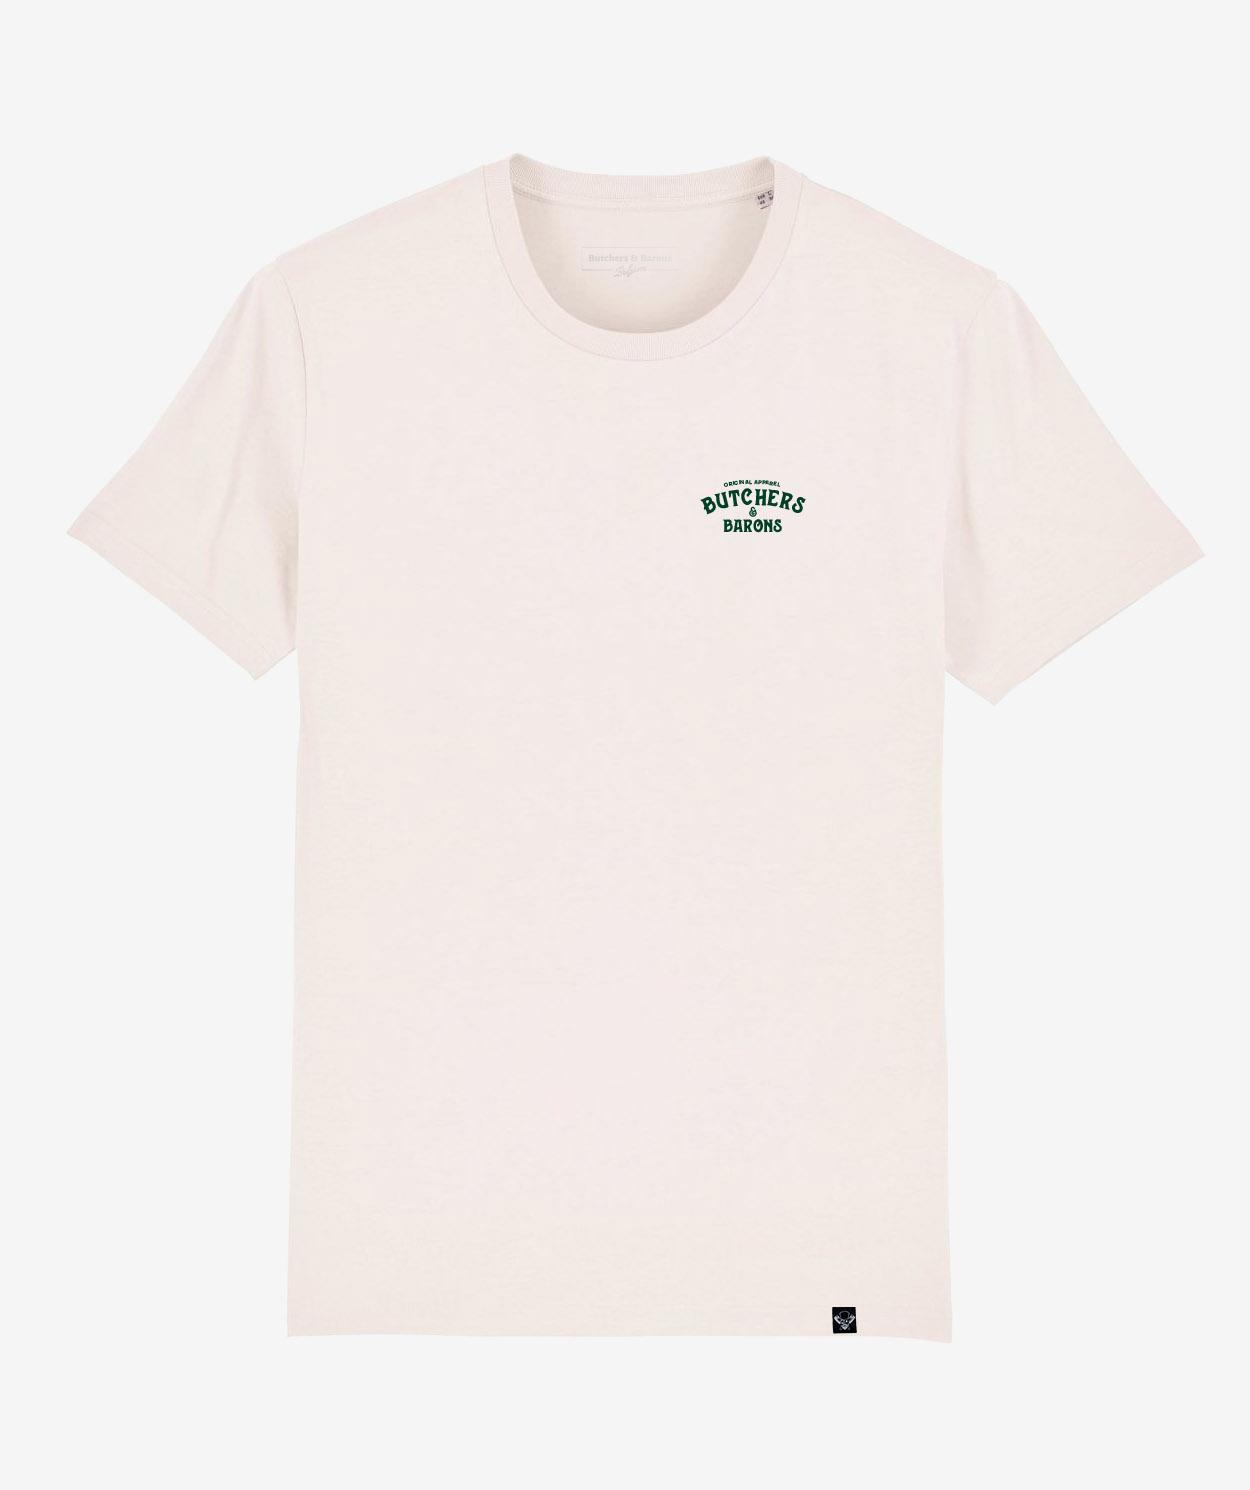 Classic white t-shirt - Butchers & Barons